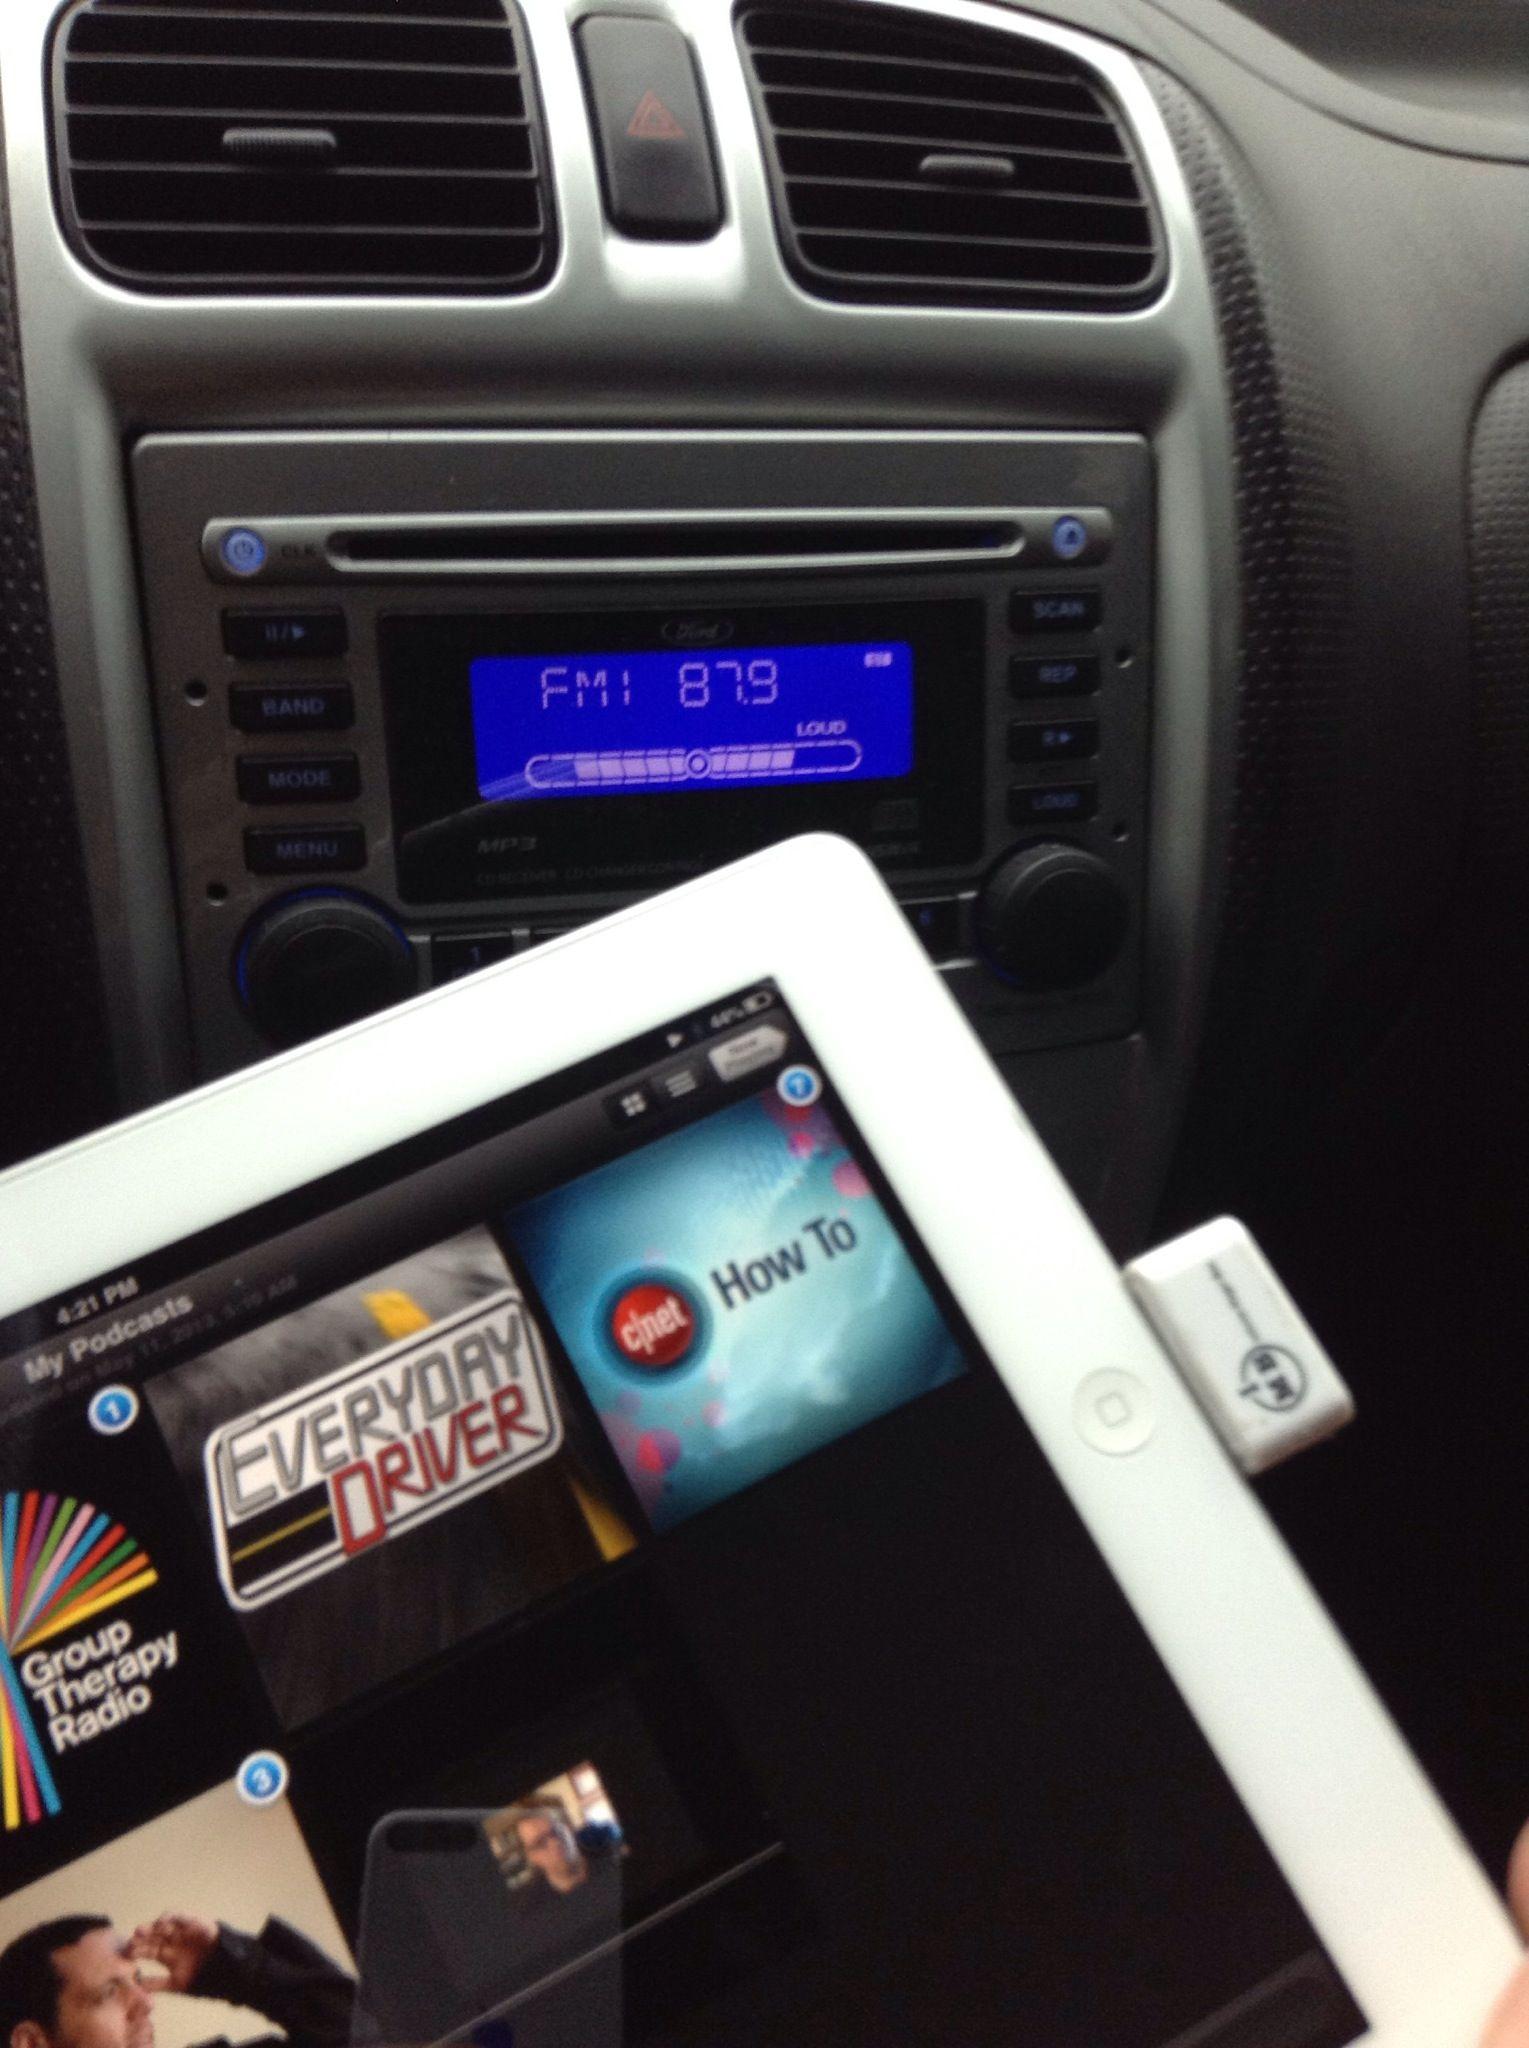 How To Connect Ipad2 To Car Radio Wirelessly No Bluetooth Recipe Car Radio Radio Car